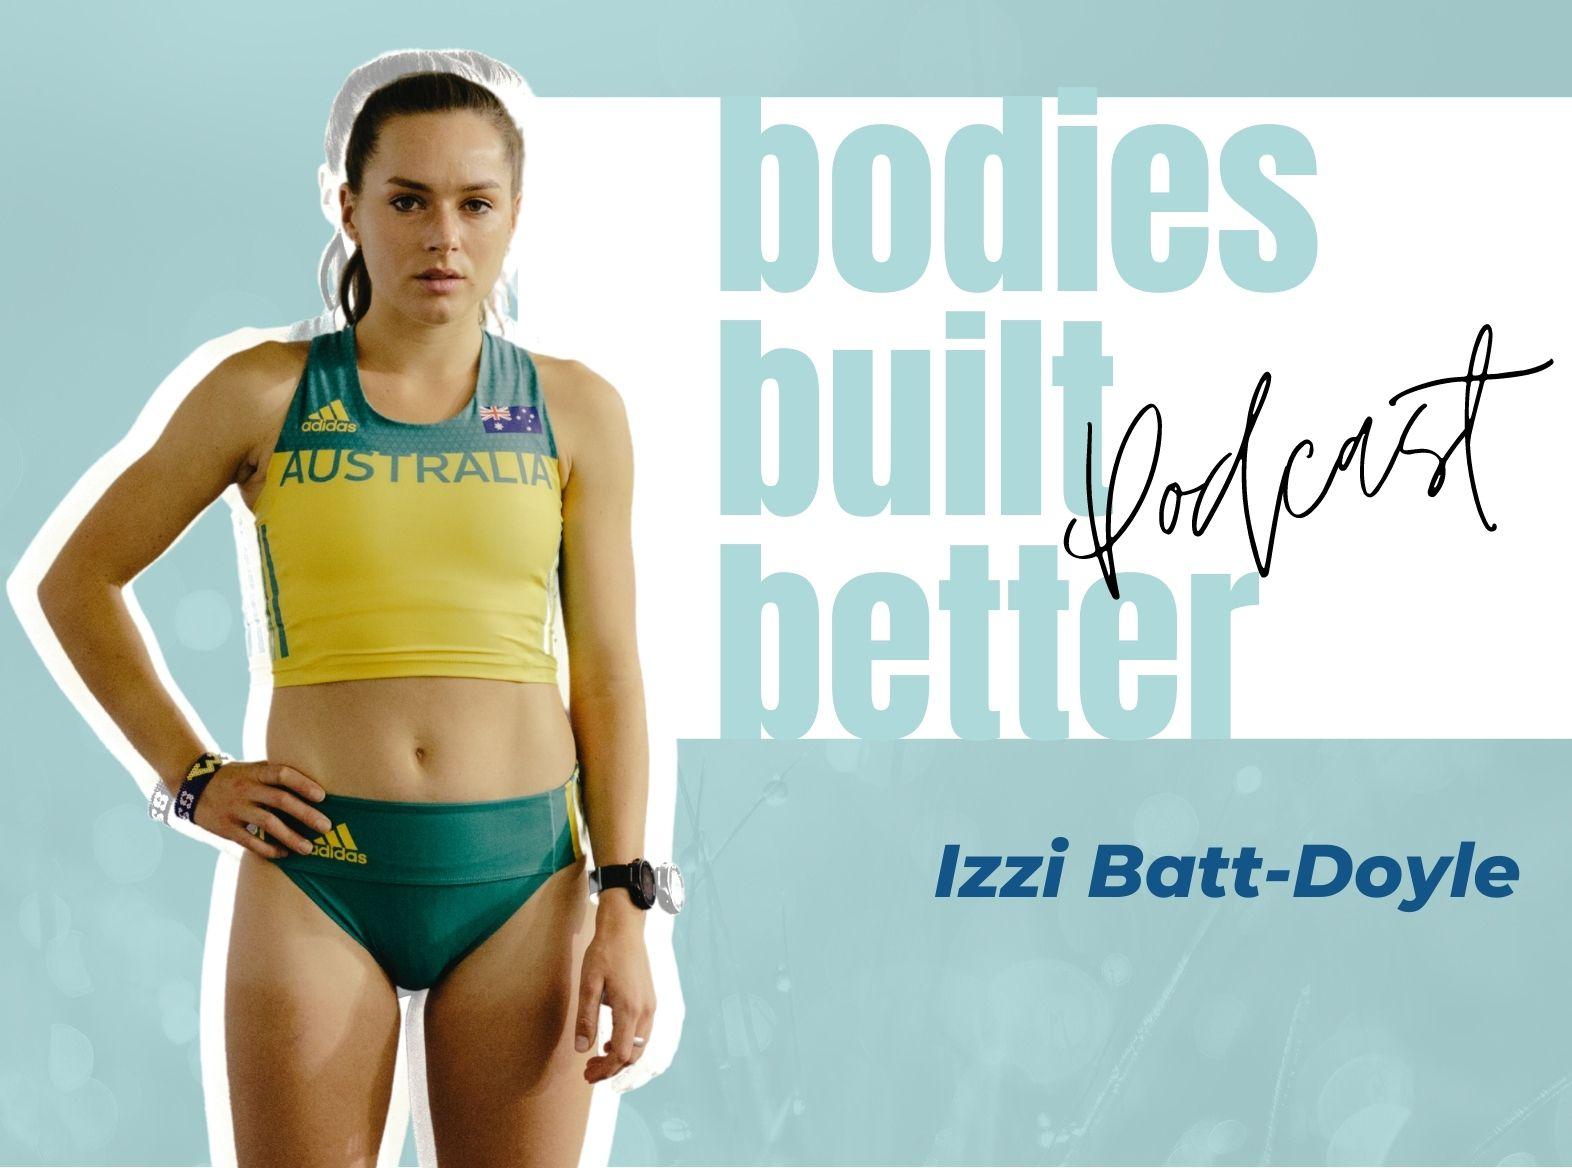 IZZI BATT-DOYLE